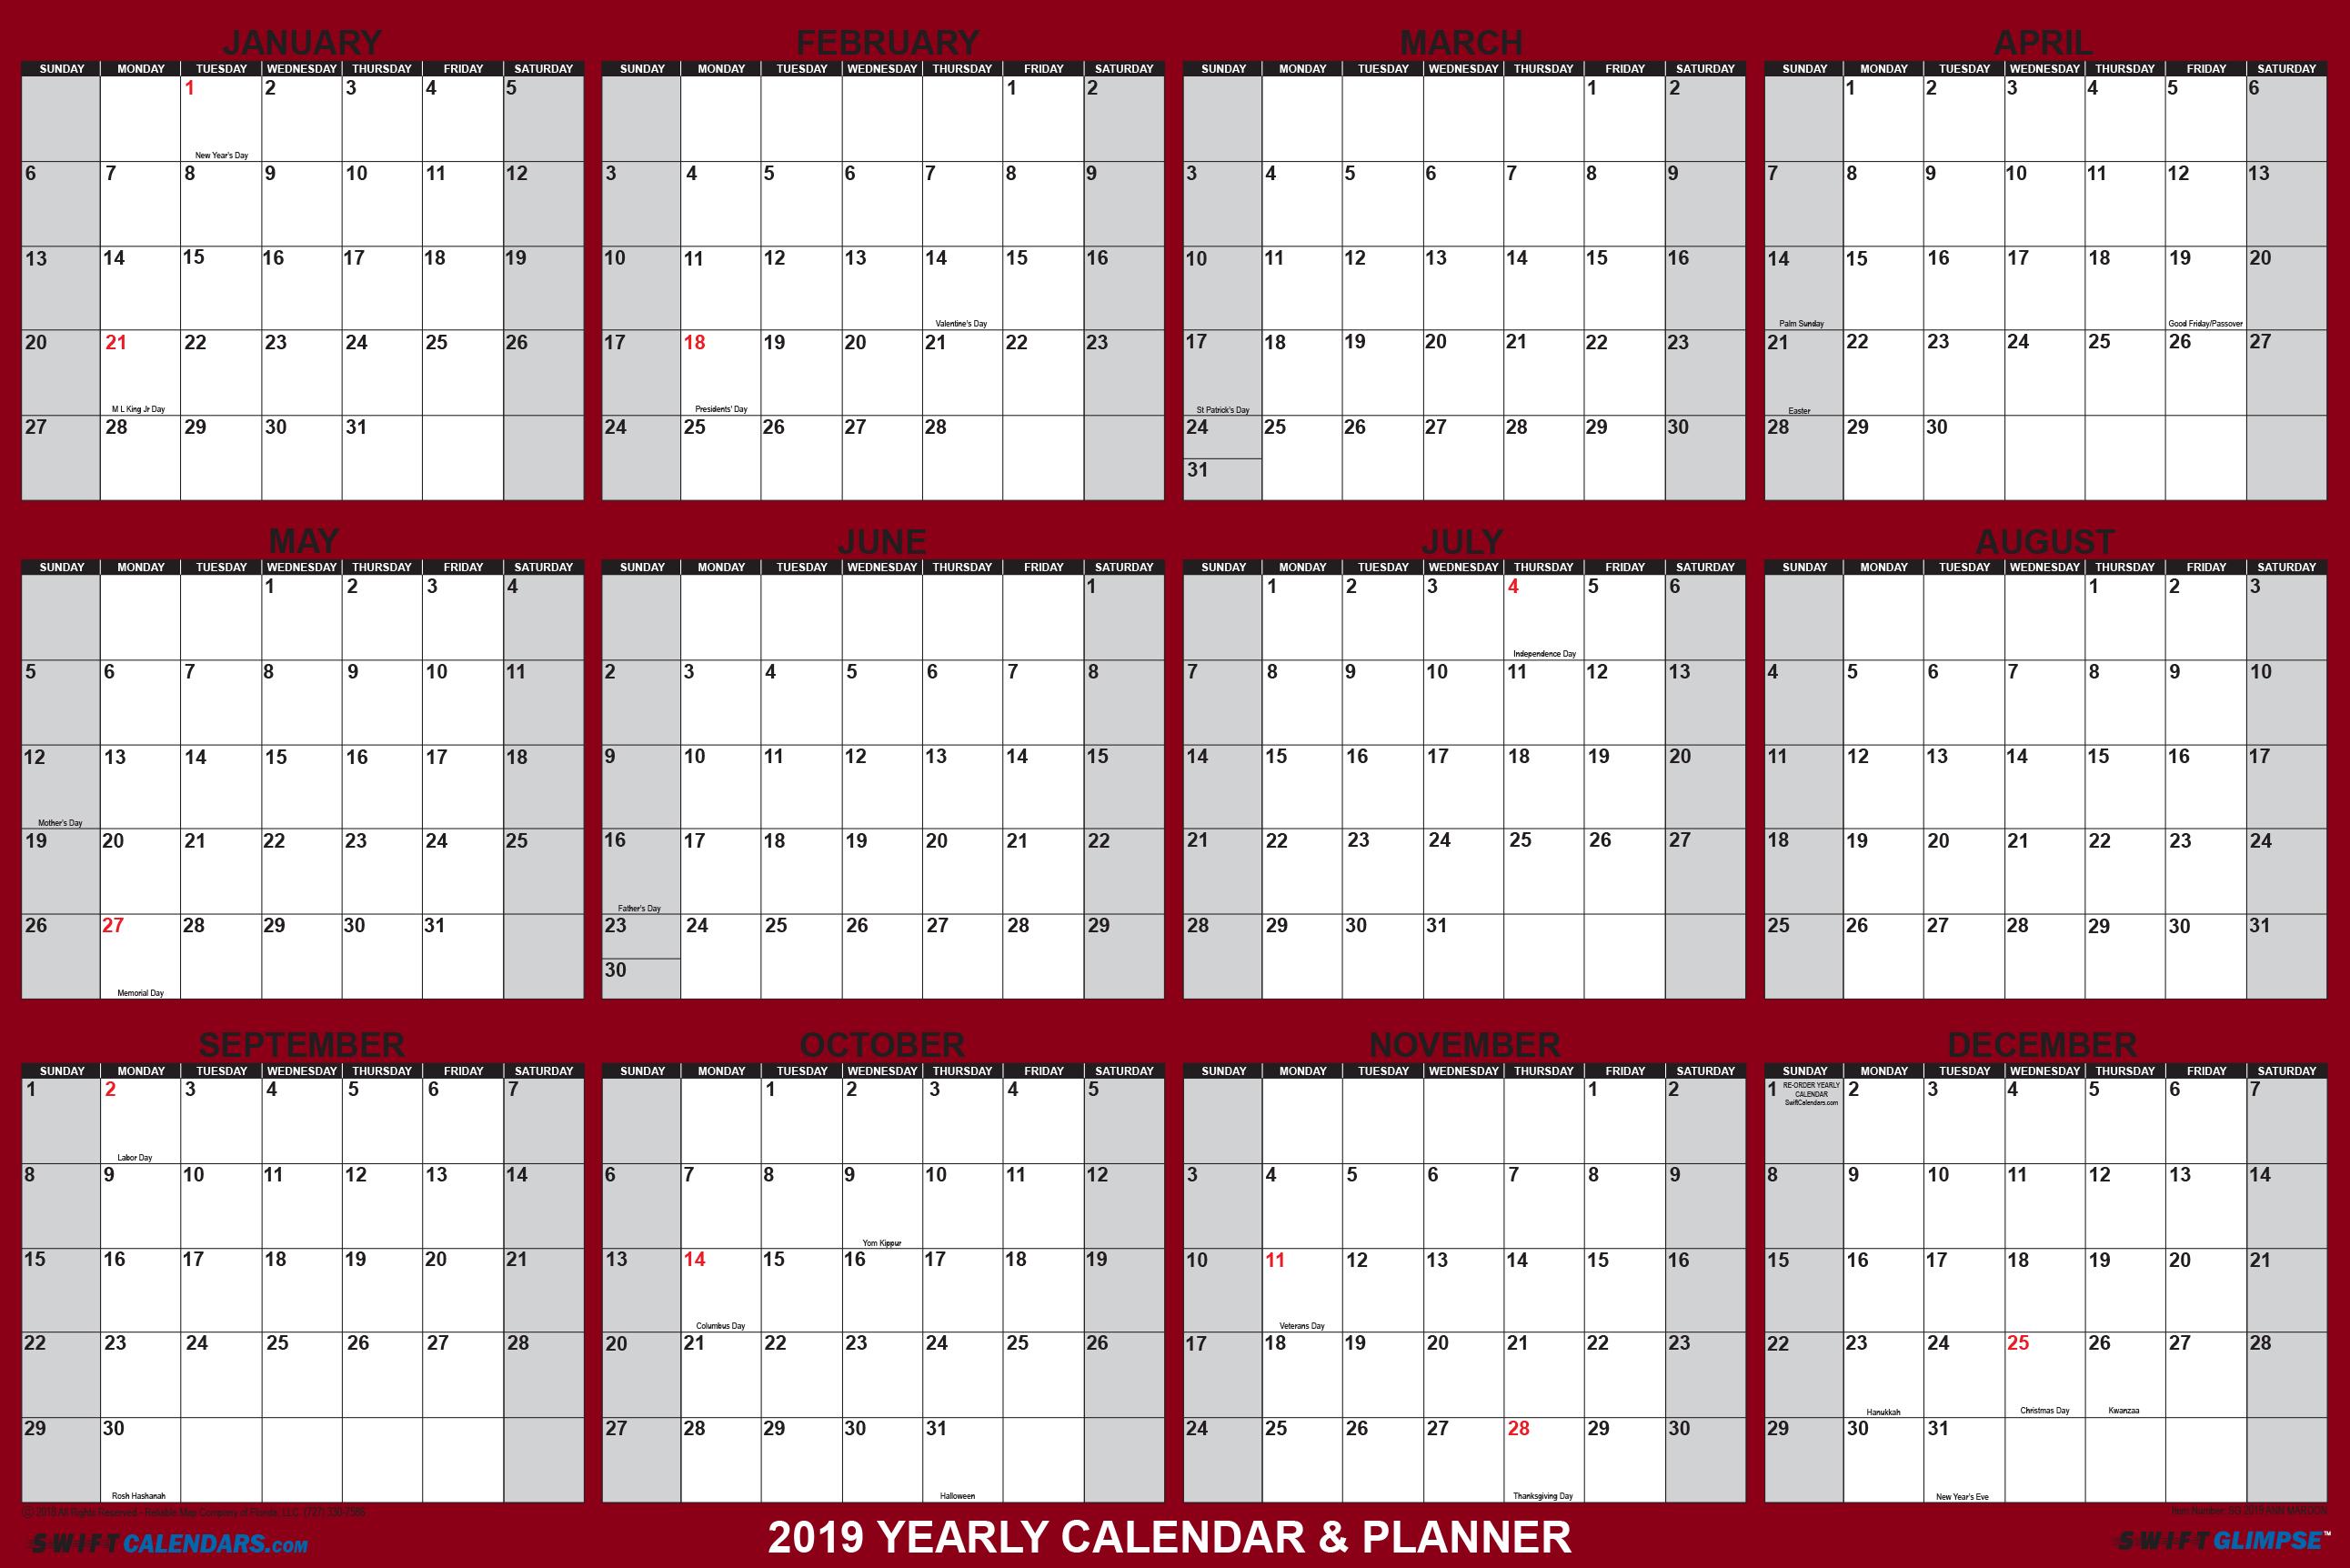 "Swiftglimpse Wall Calendar 2019, Yearly, 24 X 36"", 12 Months Laminated Calendar X 2019"